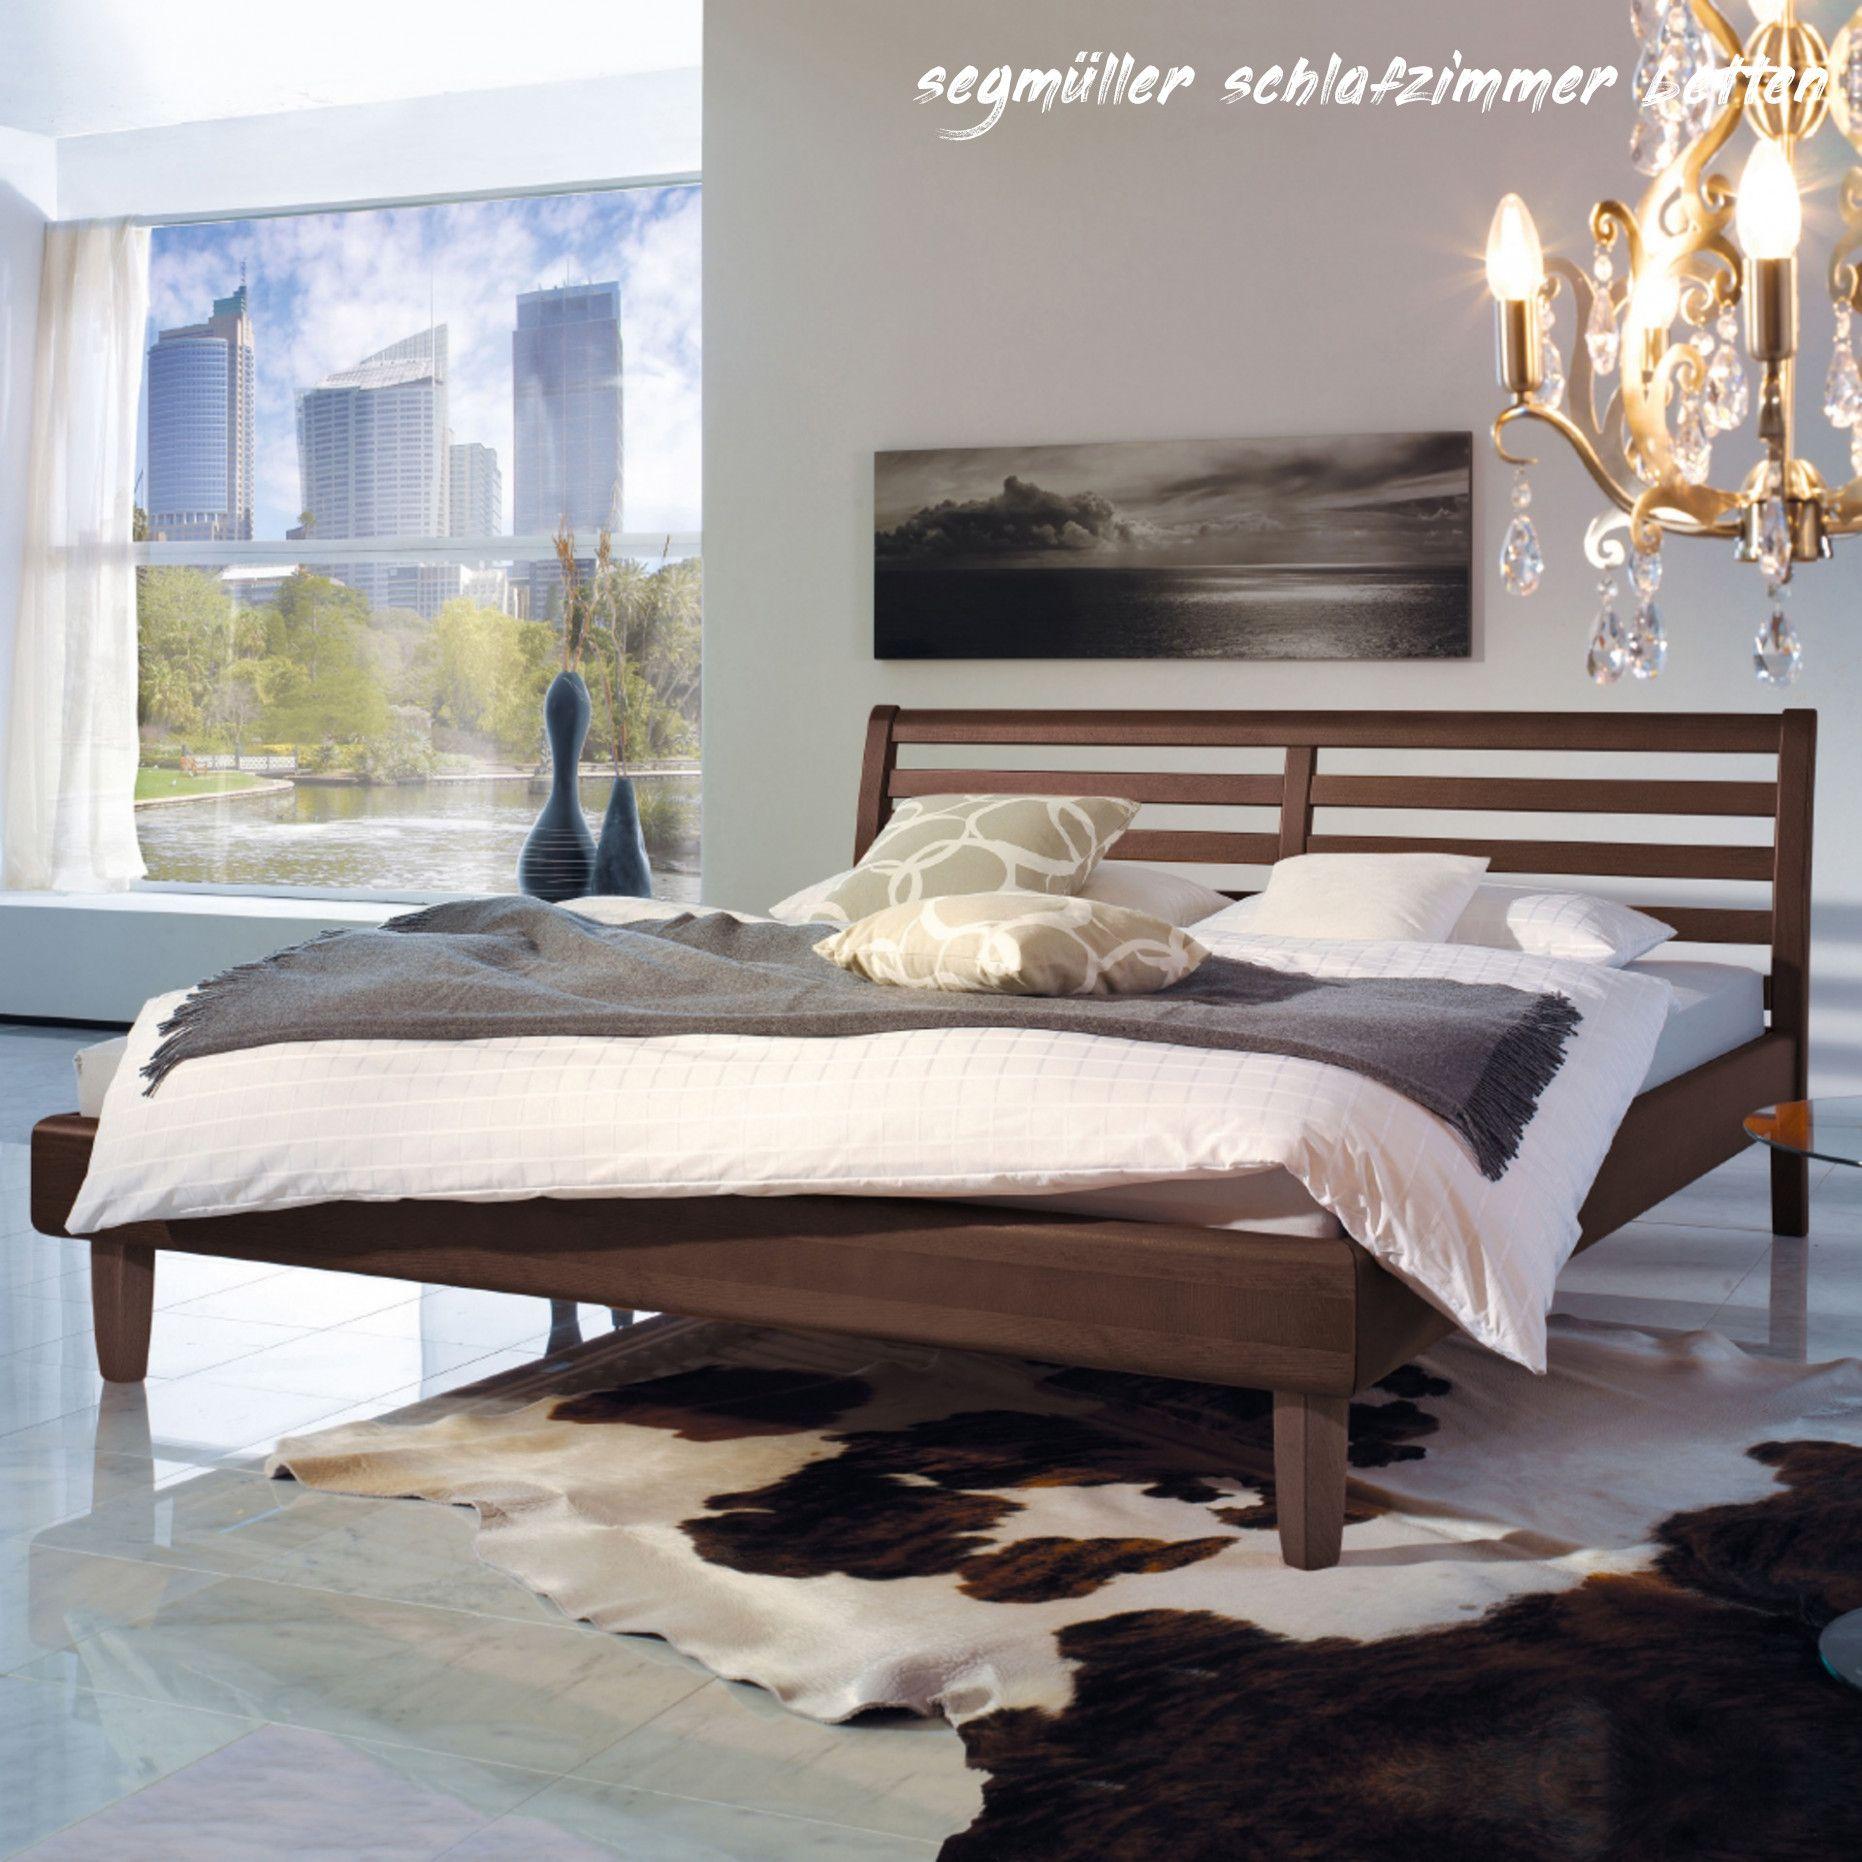 7 Segmuller Schlafzimmer Betten In 2020 Massivholzbett Dekor Bett